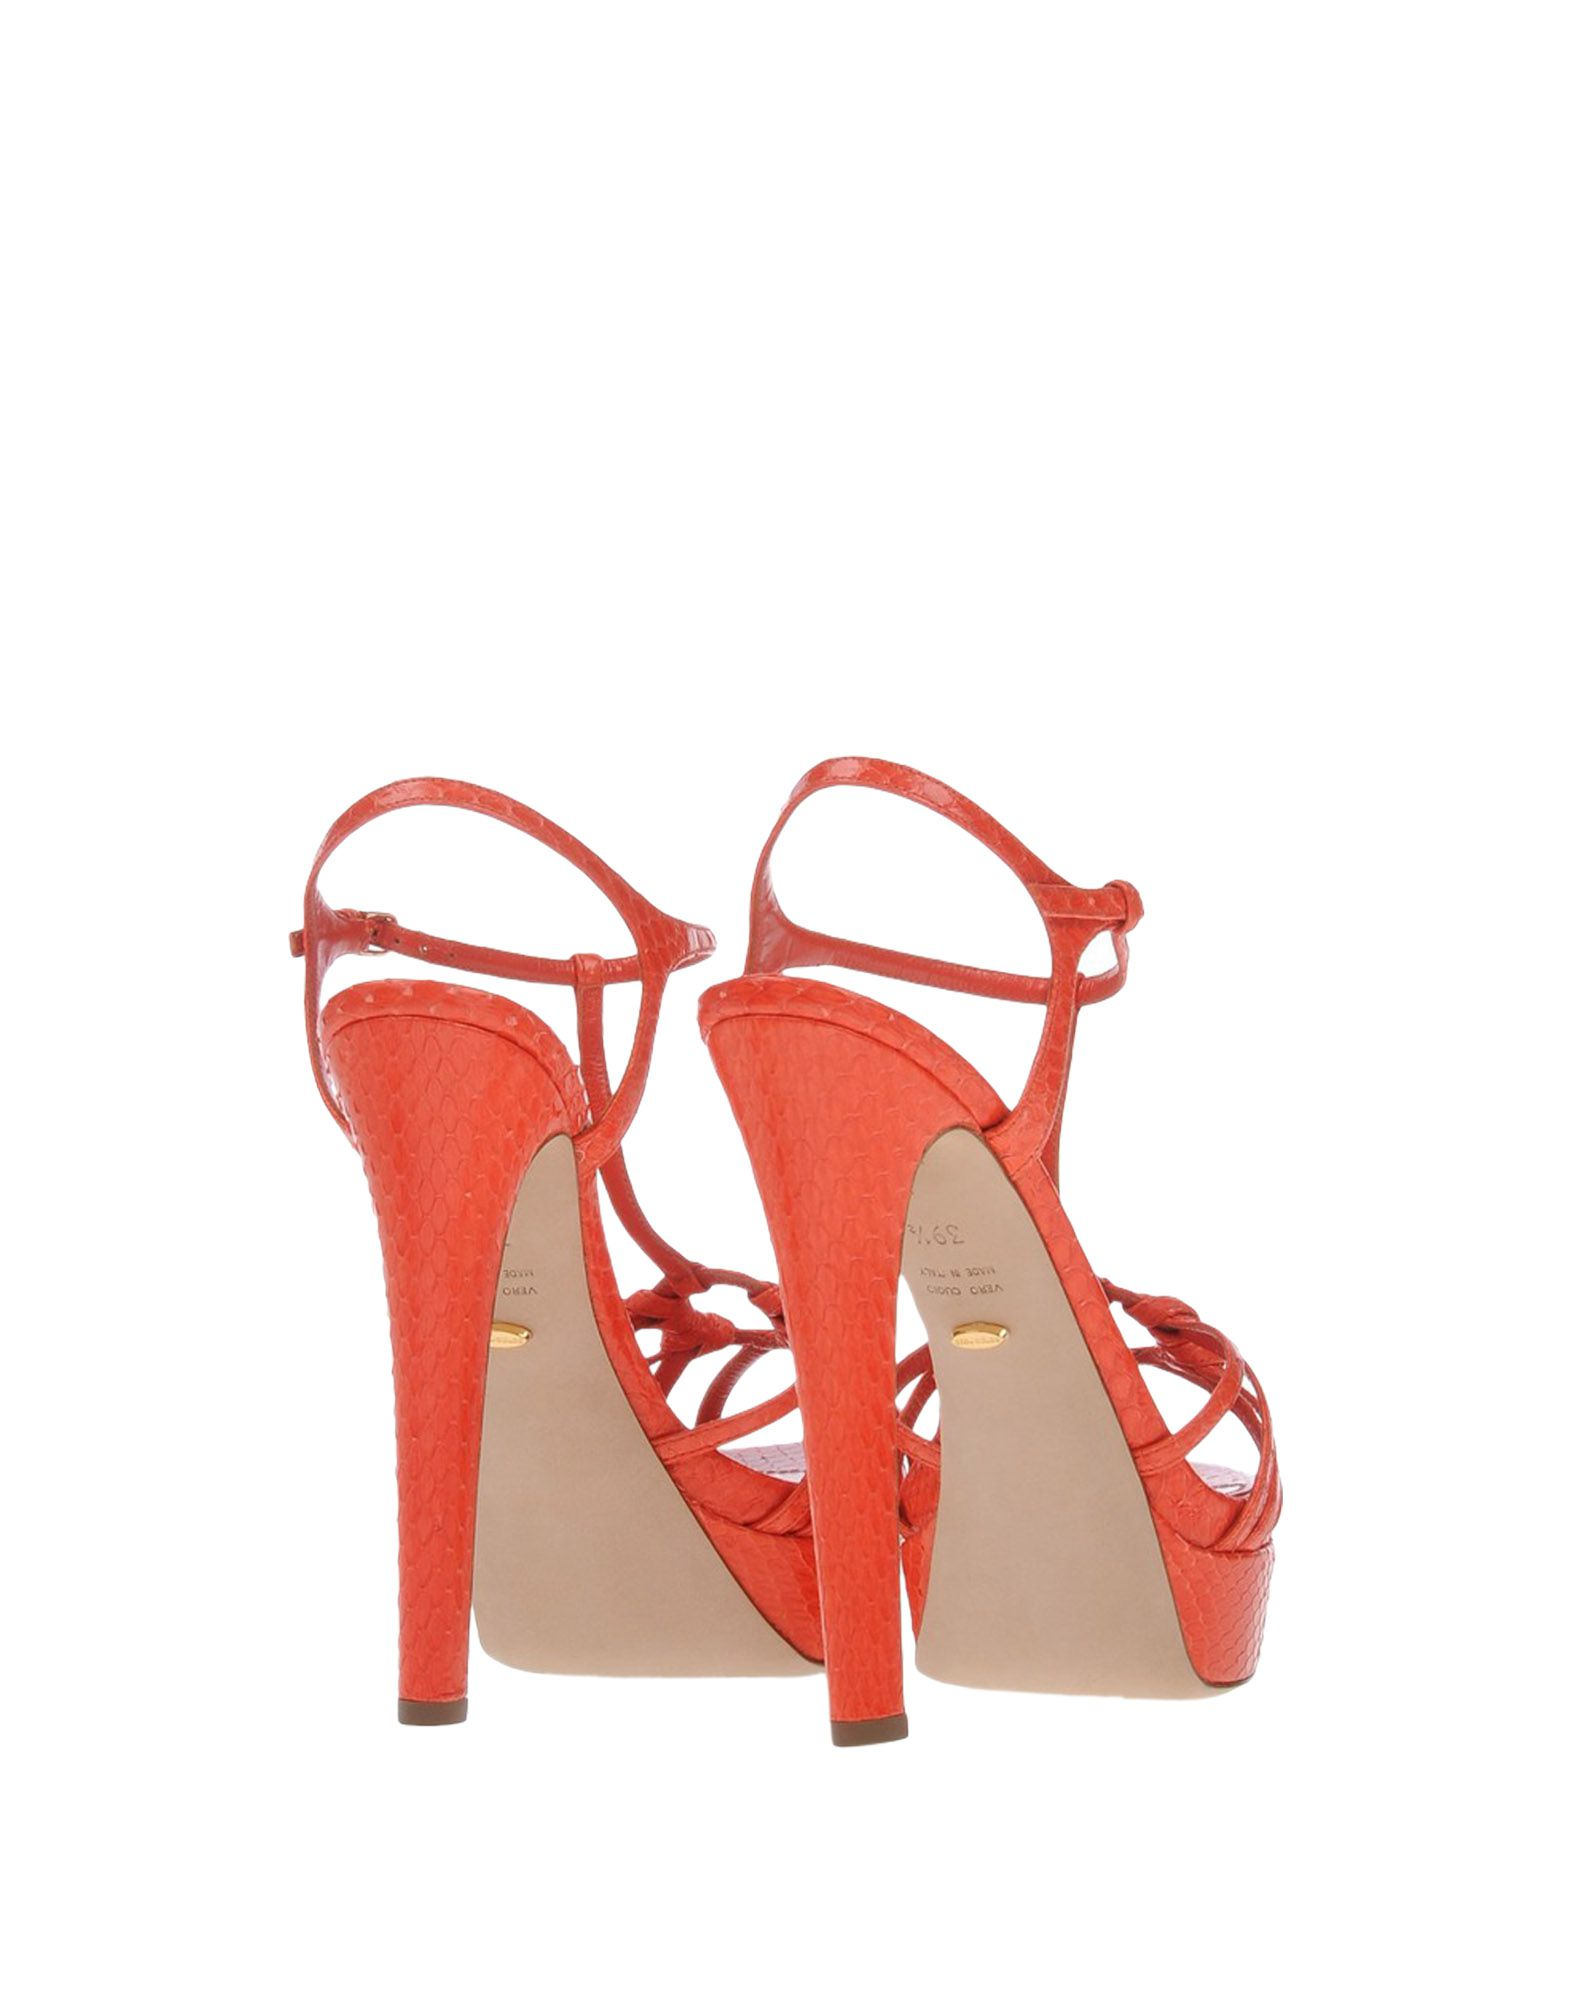 Stilvolle billige Schuhe Damen Sergio Rossi Sandalen Damen Schuhe  11427903ES fc64c0